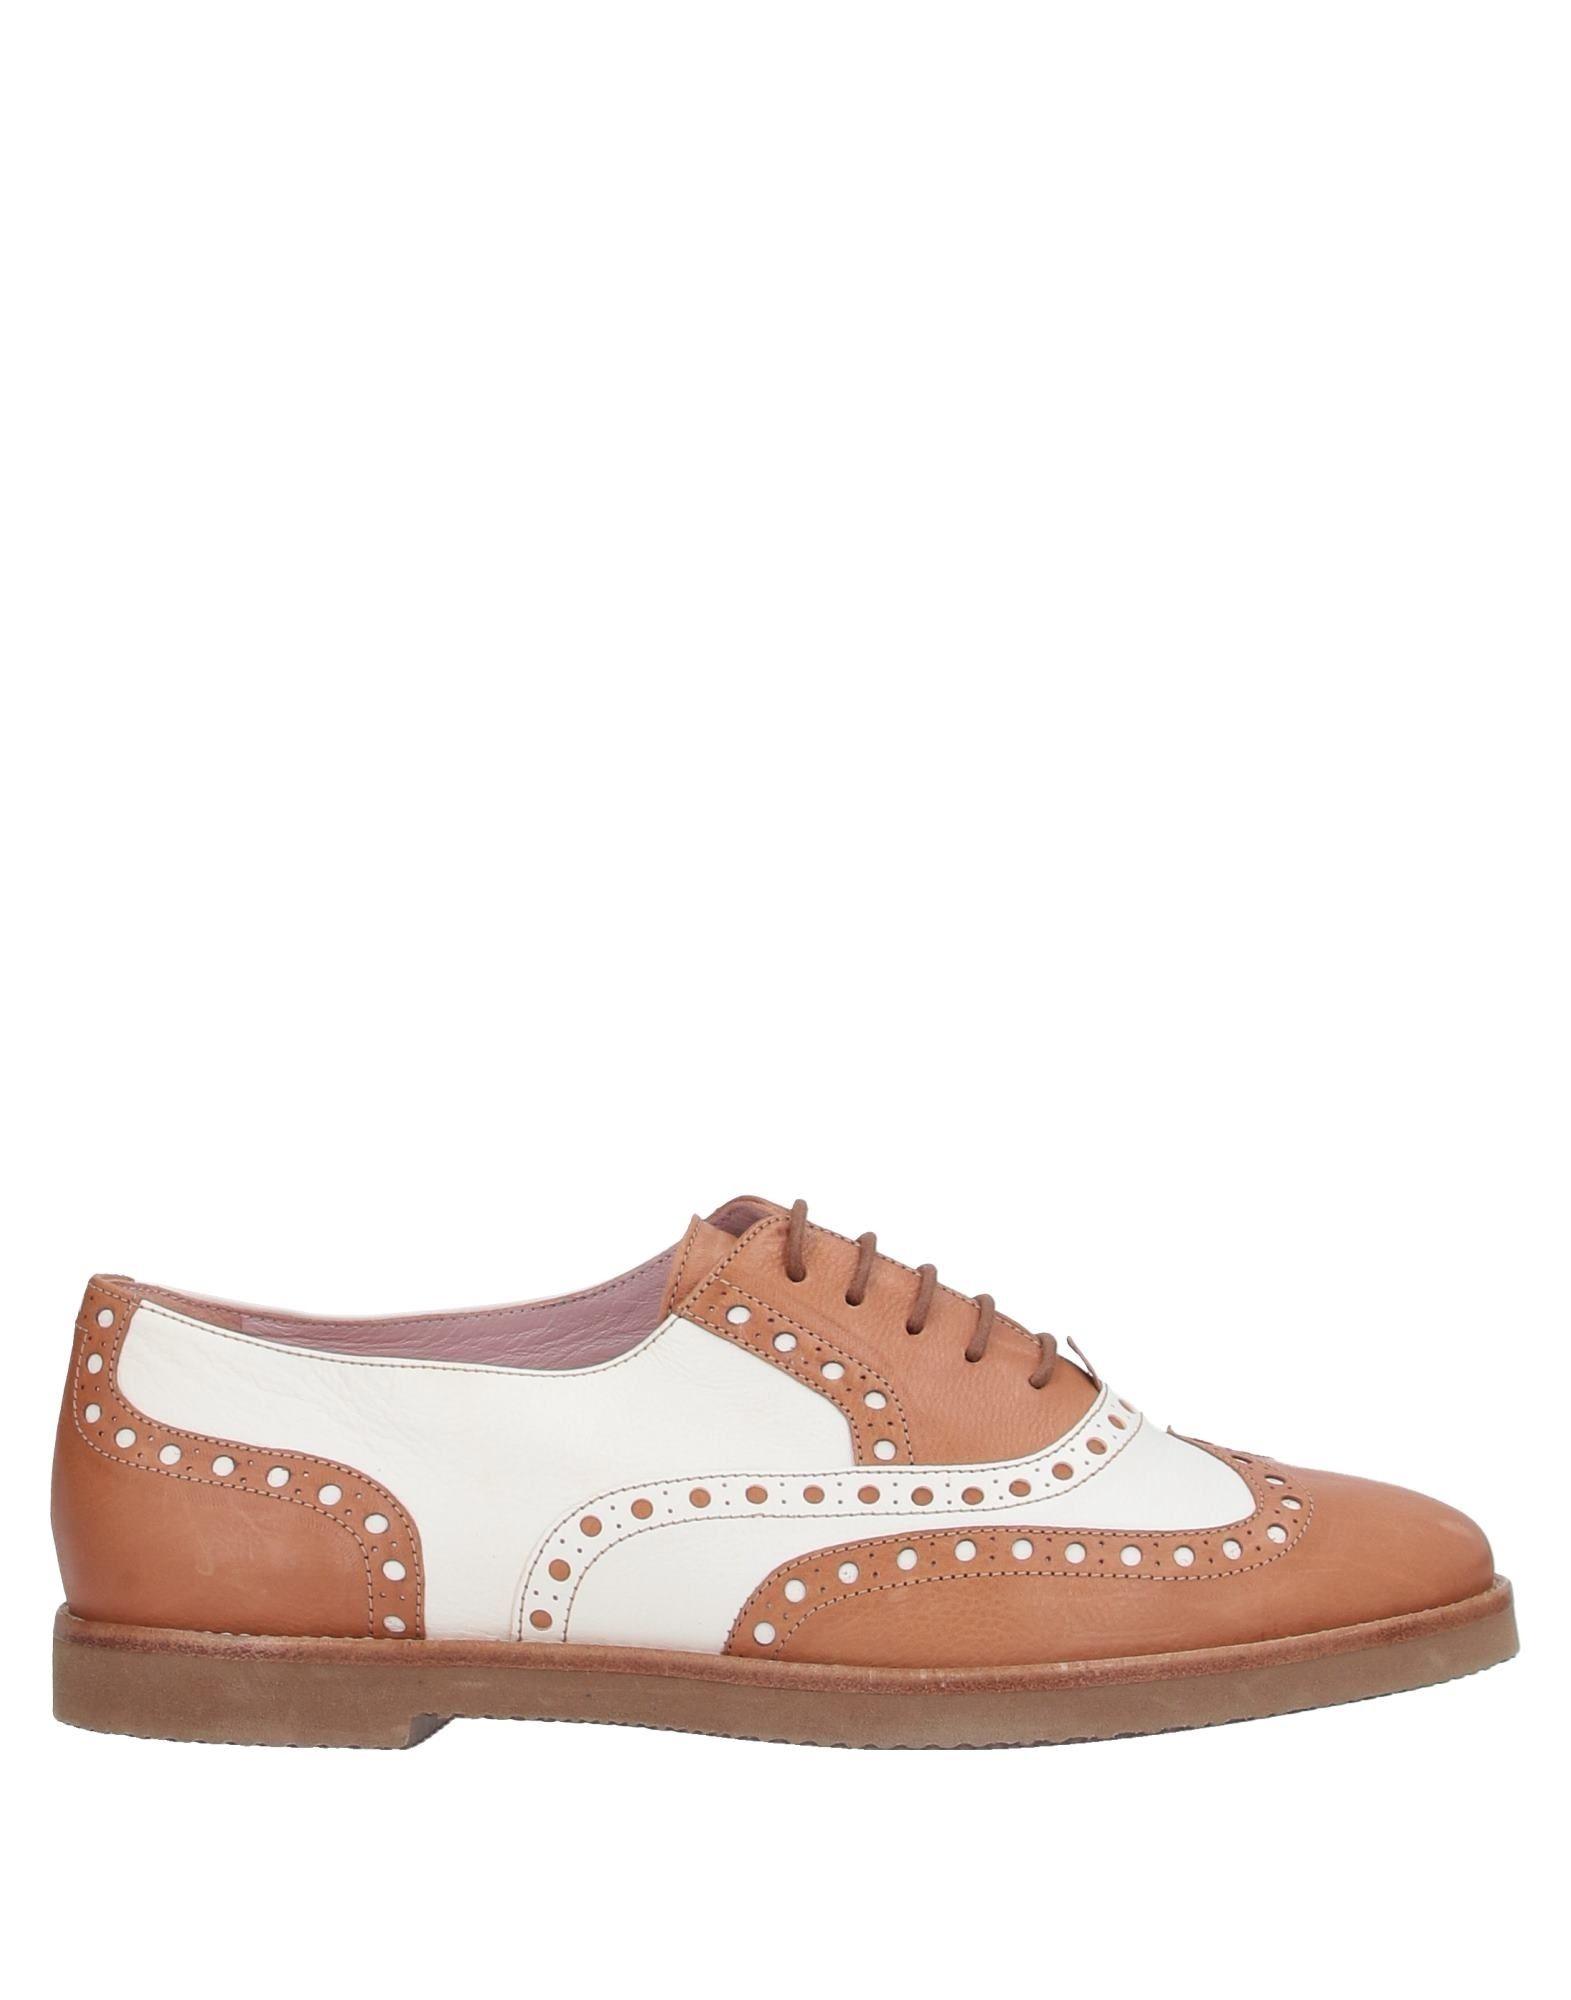 Фото - PRETTY LOAFERS Обувь на шнурках loafers el caballo loafers